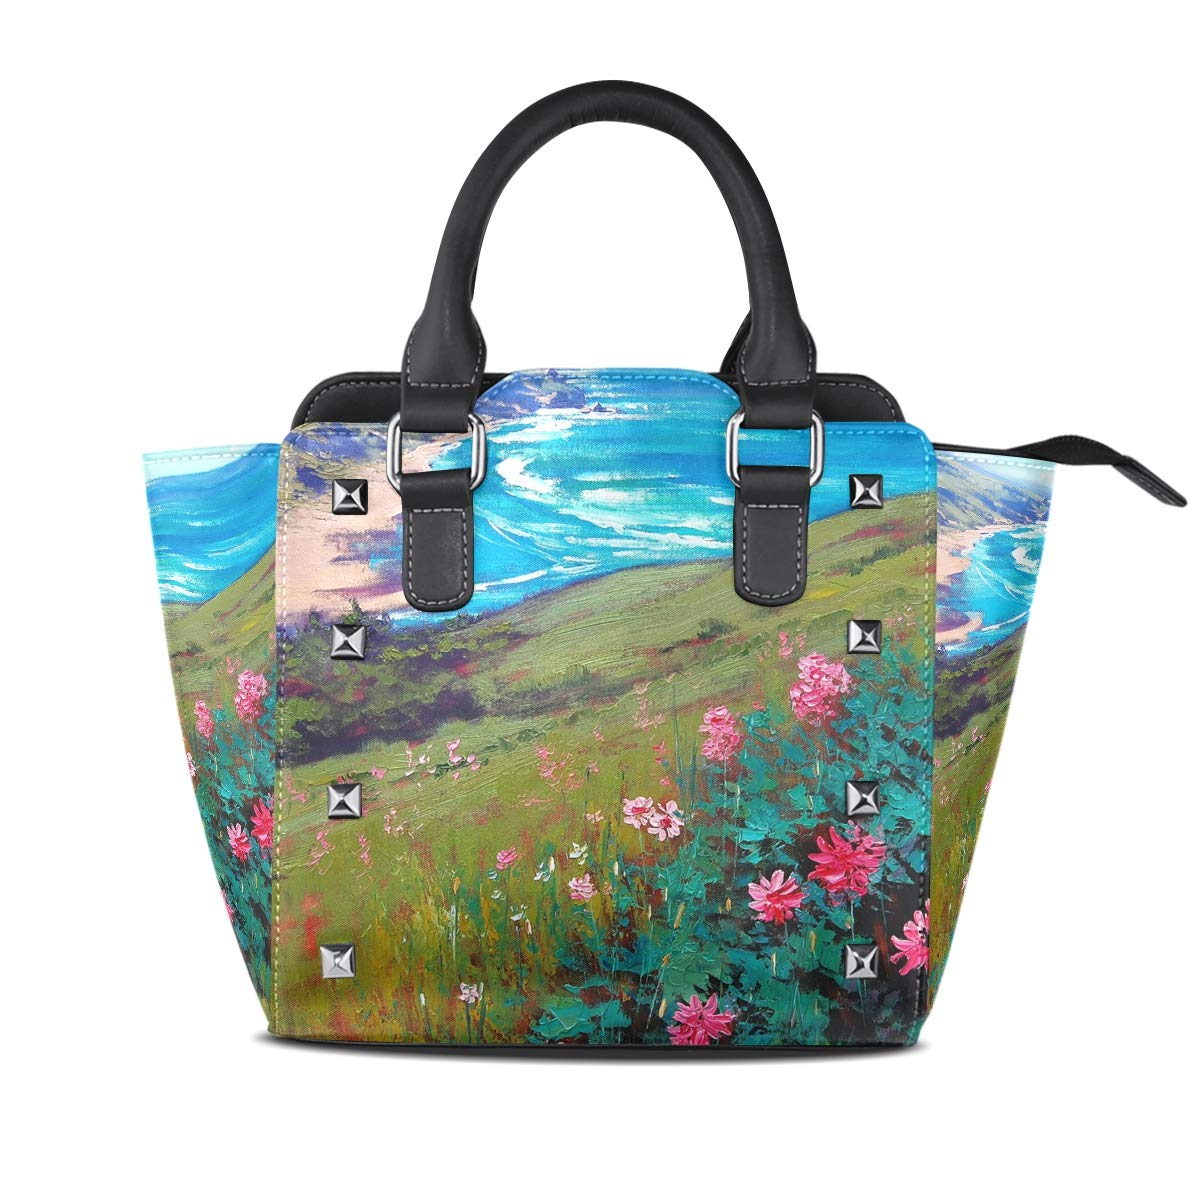 Design2 Handbag Mountain Water Genuine Leather Tote Rivet Bag Shoulder Strap Top Handle Women